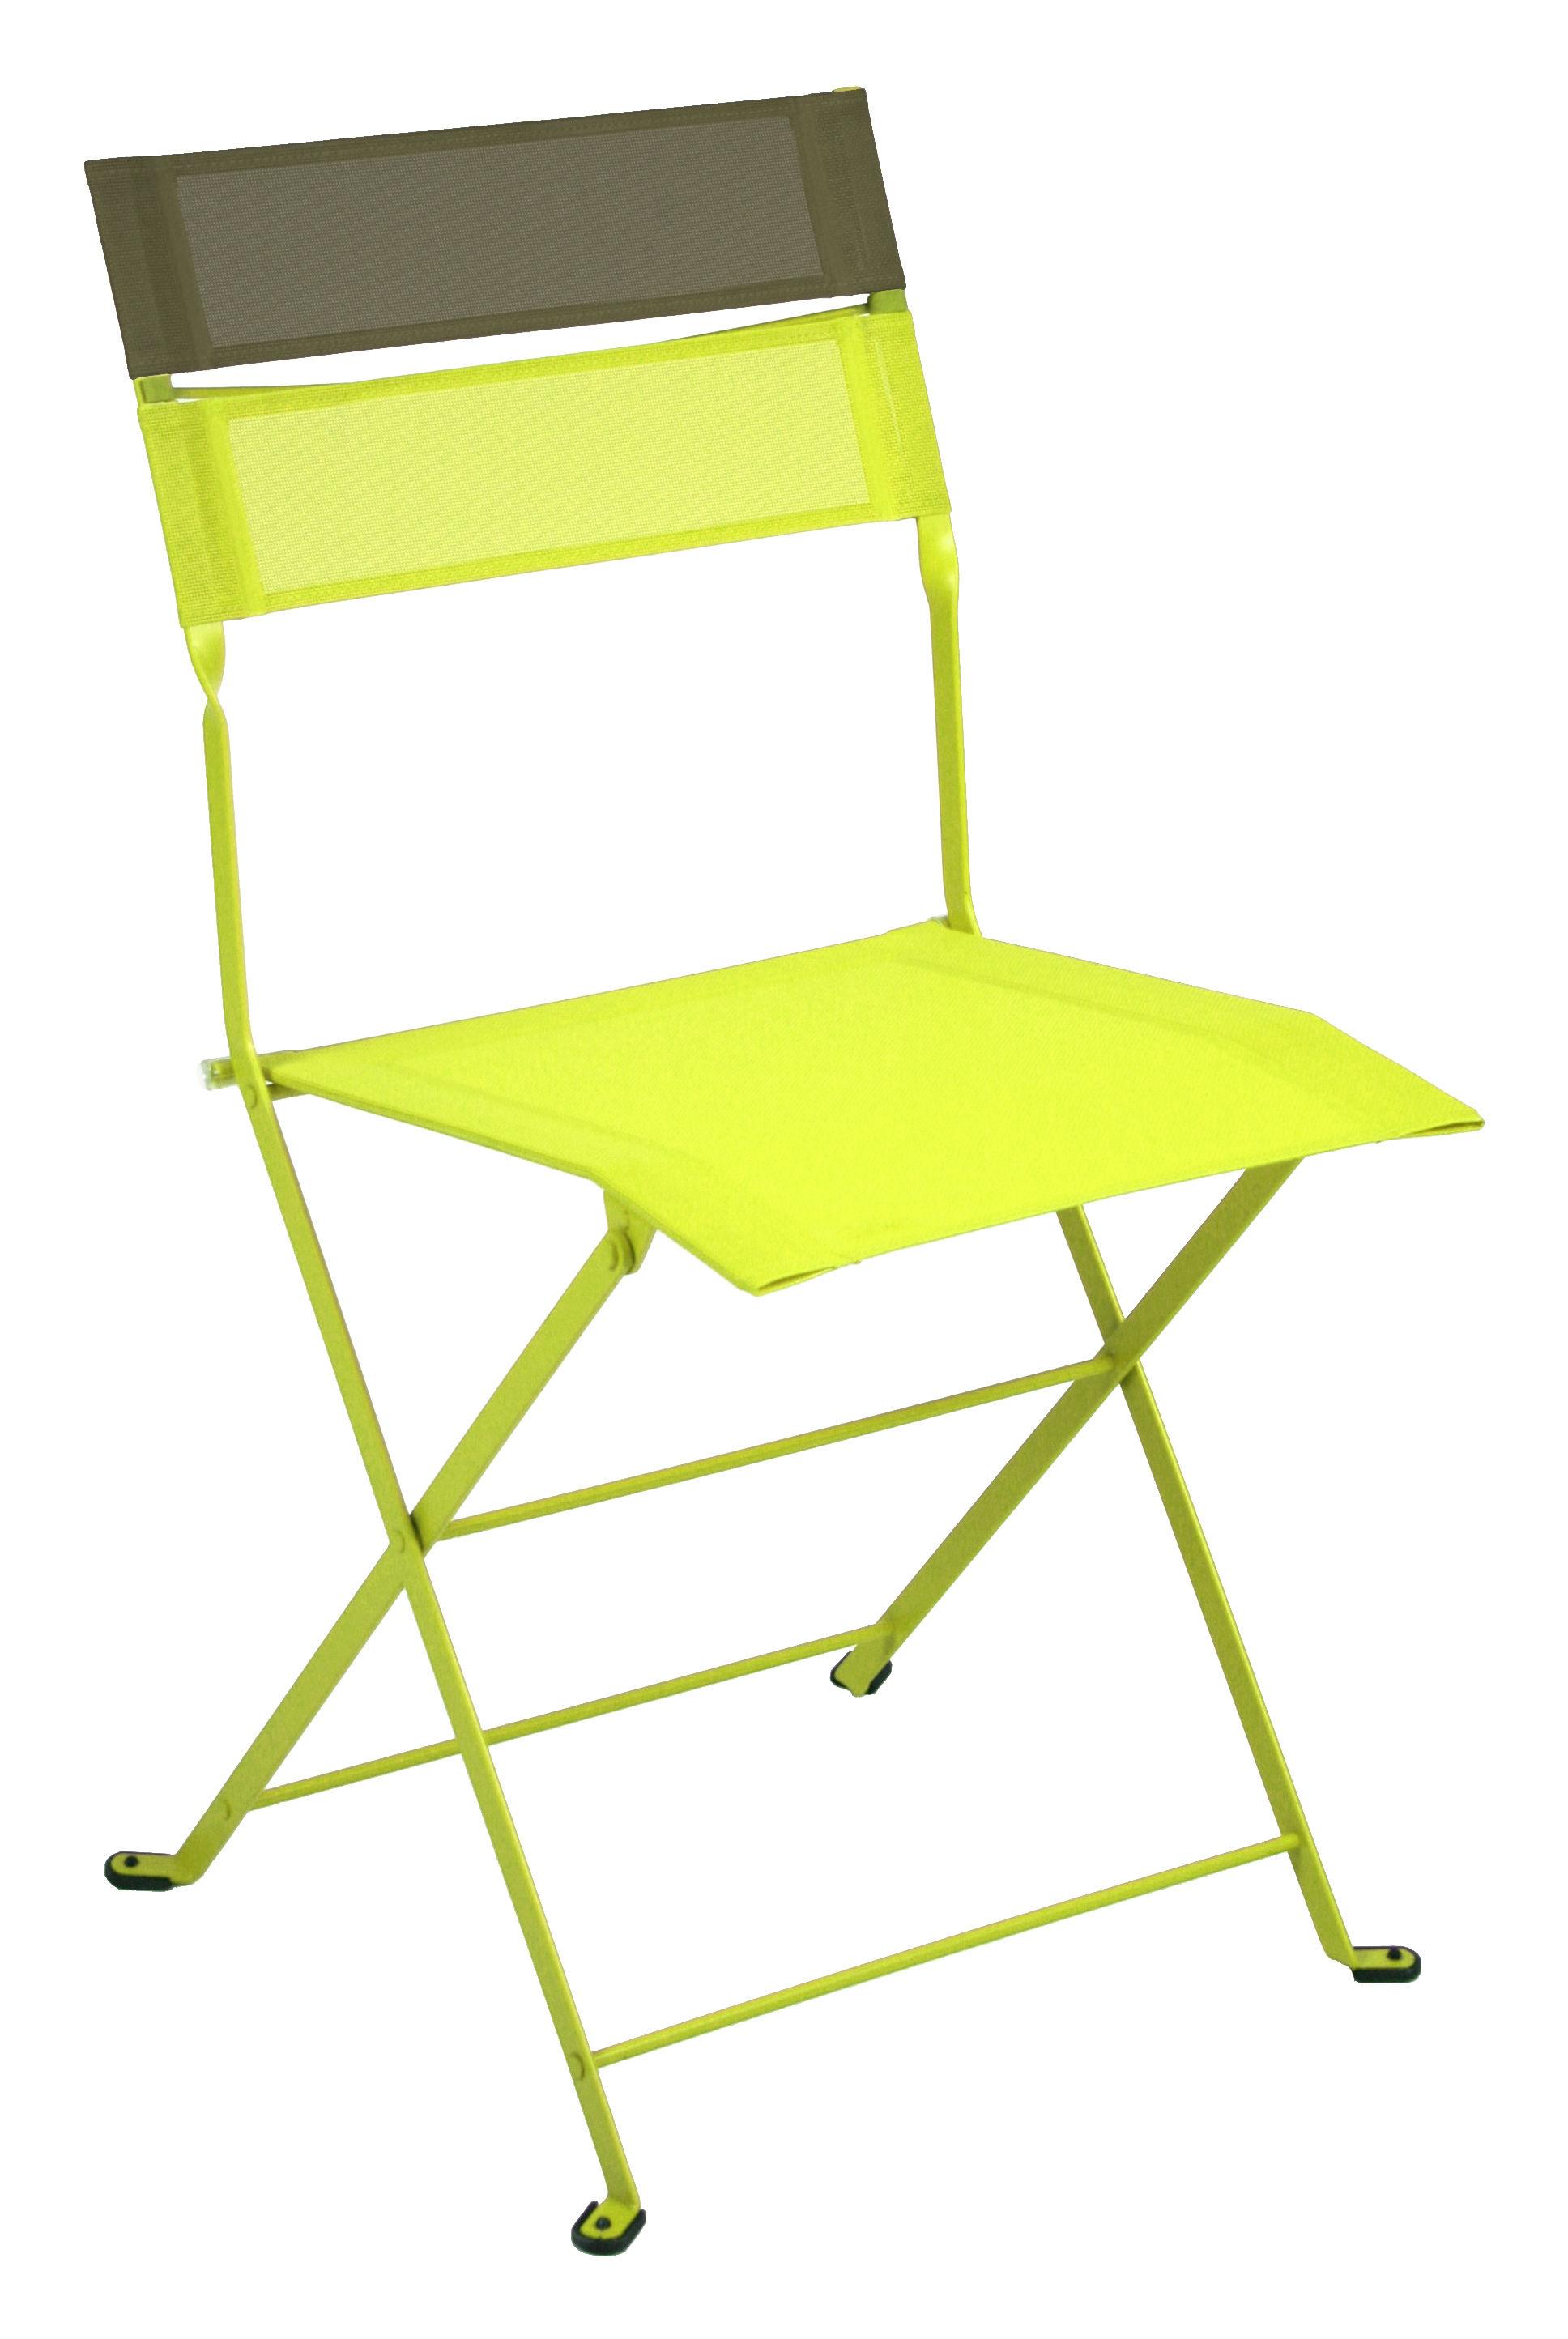 Chaise pliante latitude toile verveine bandeau savane fermob - Chaise pliante en toile ...